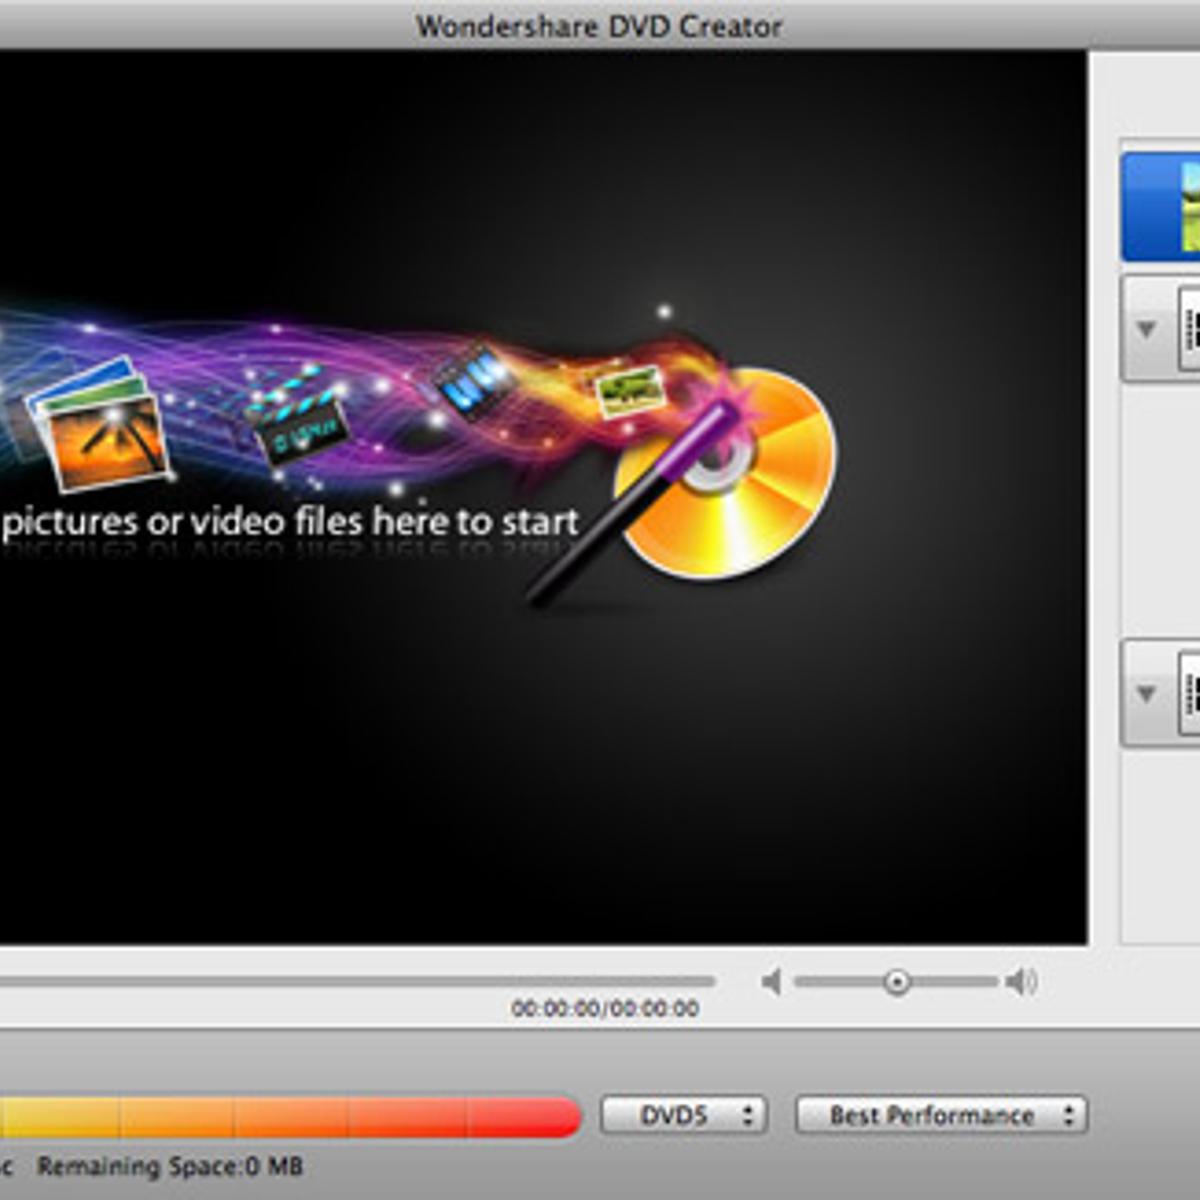 Wondershare DVD Creator Alternatives and Similar Software